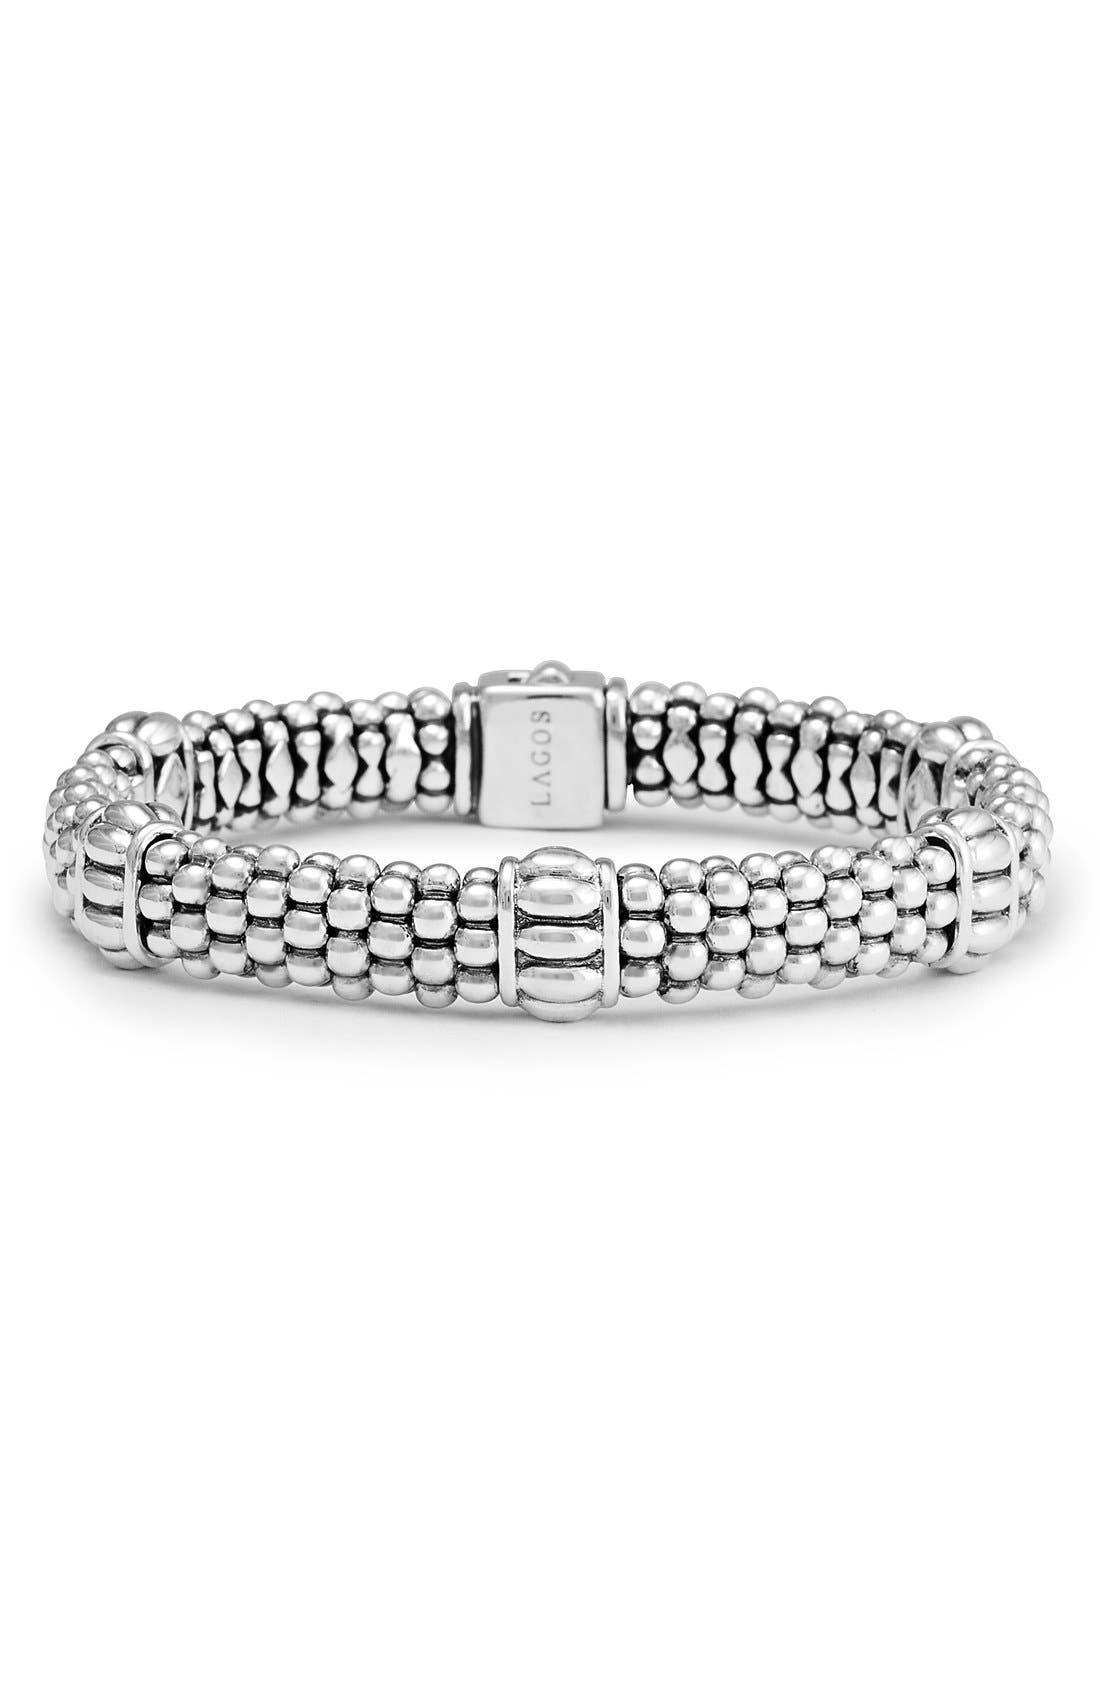 Main Image - LAGOS Fluted Station Caviar Rope Bracelet